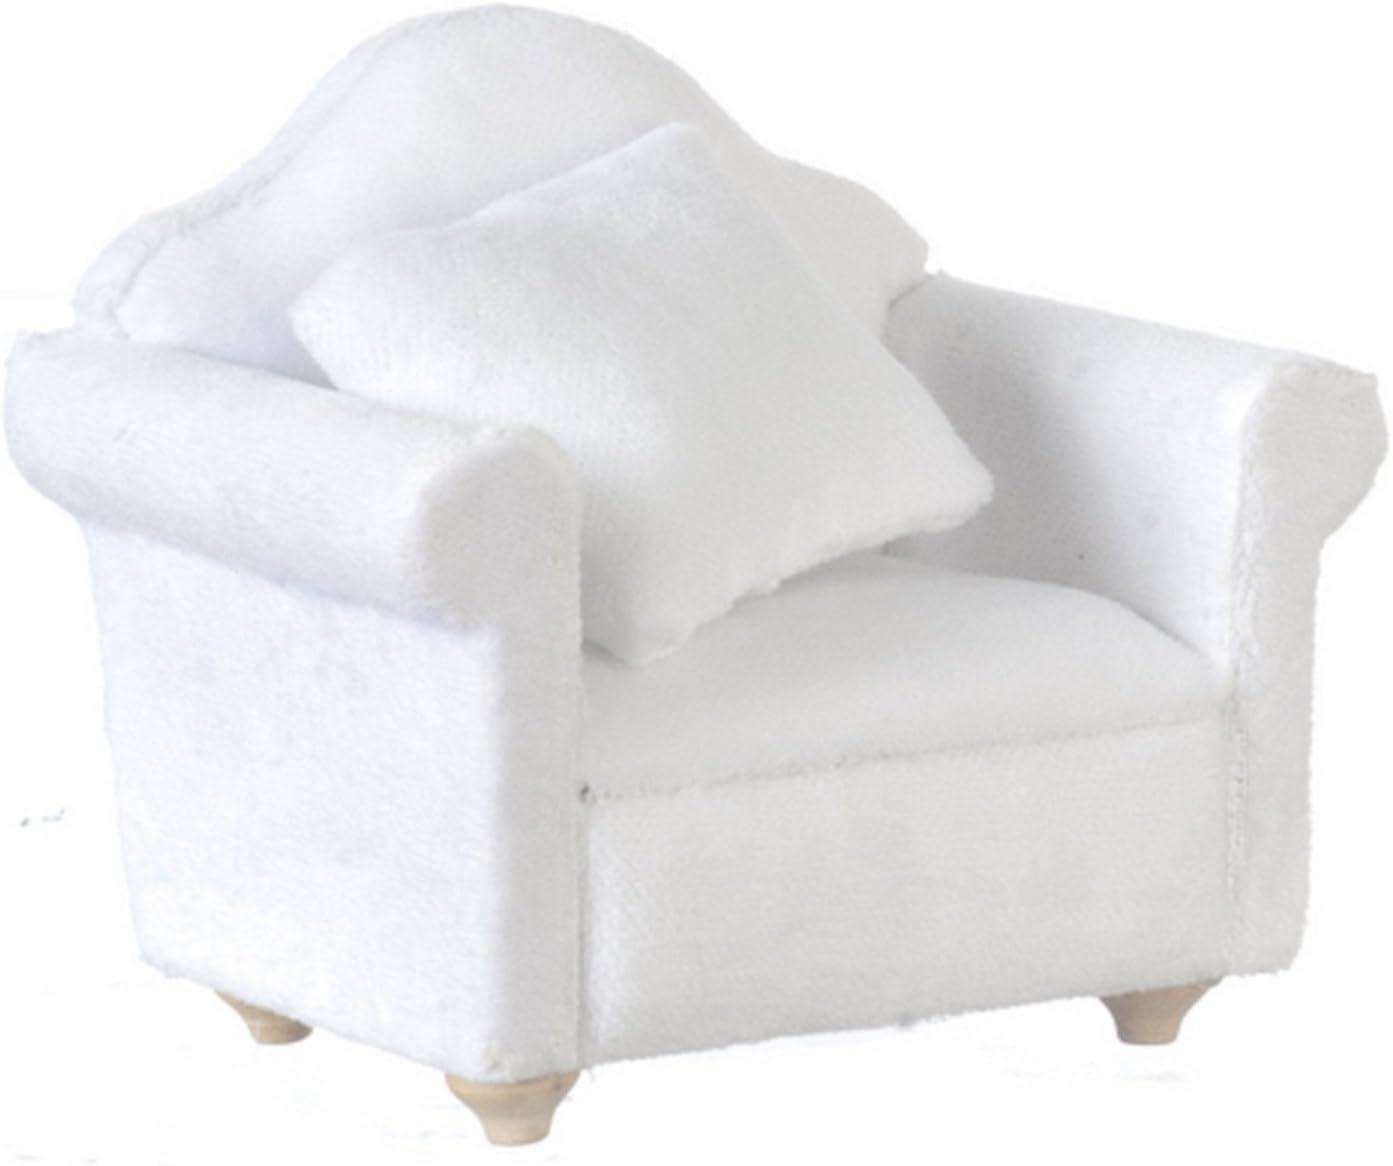 Melody Jane Dollhouse White Velour Armchair Modern 1:12 Miniature Living Room Furniture